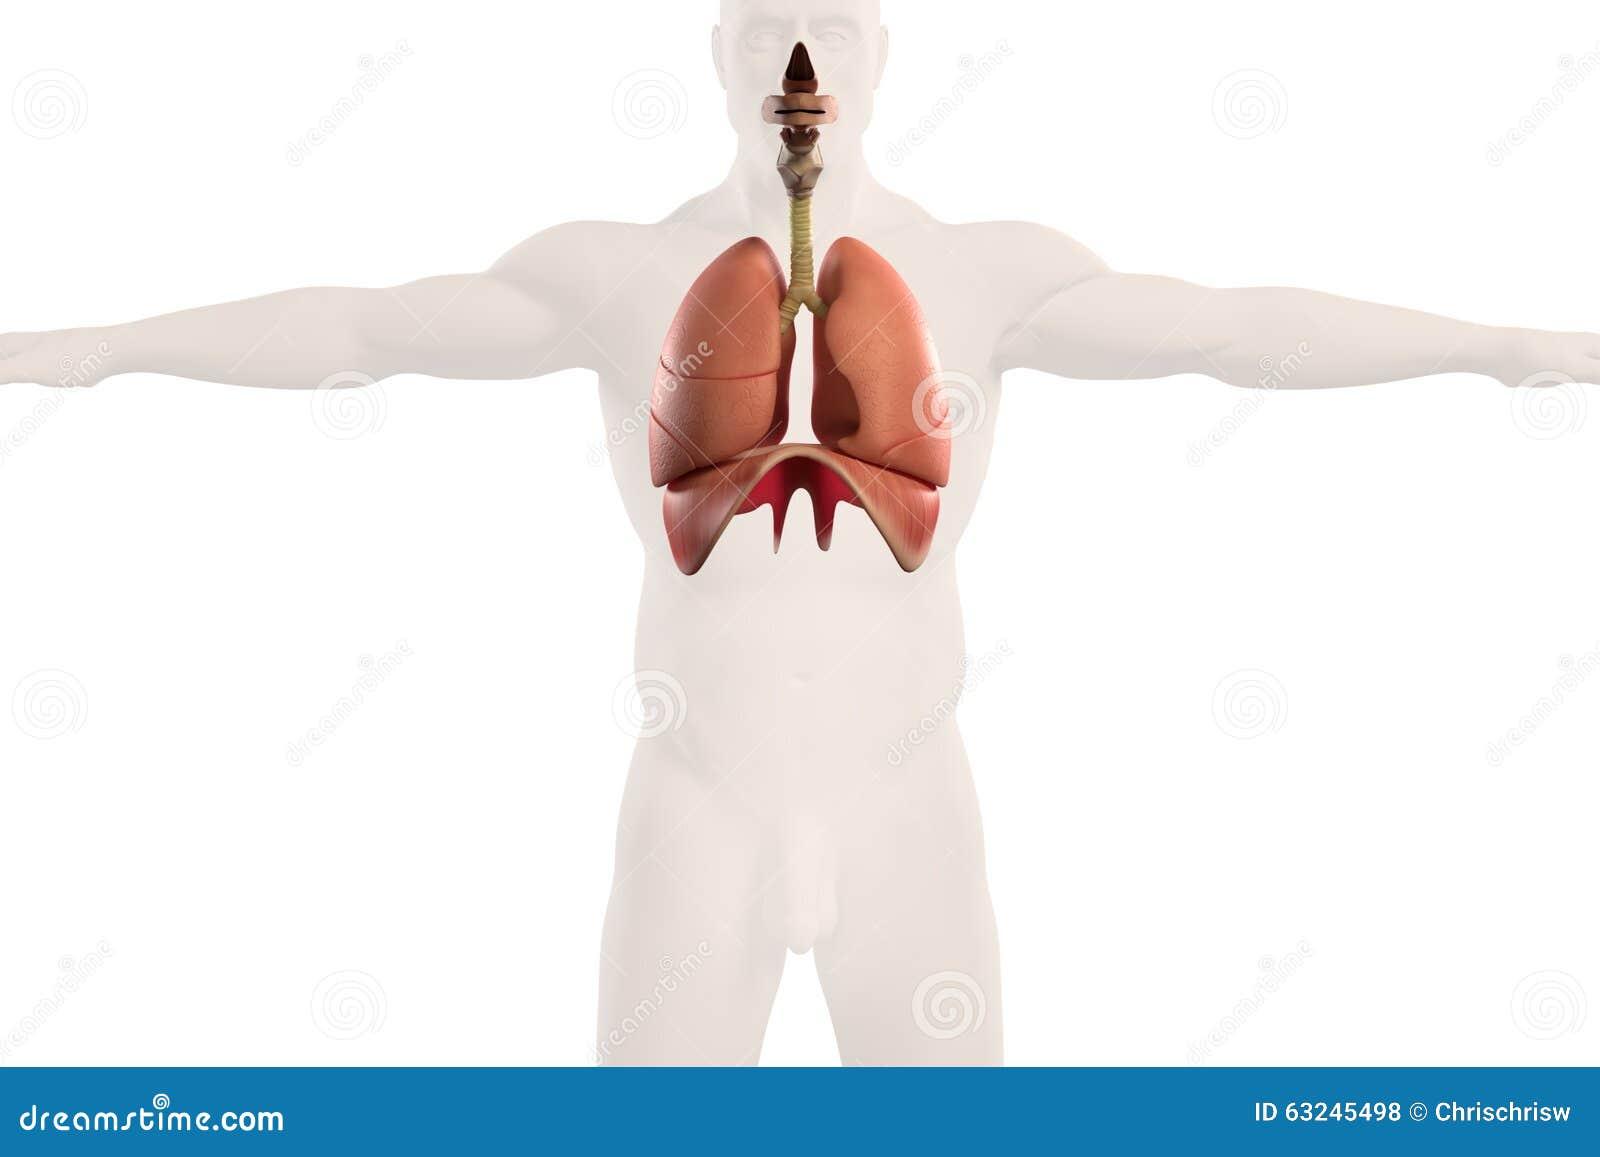 Human Anatomy Xray View Of Respiratory System, On Plain White ...